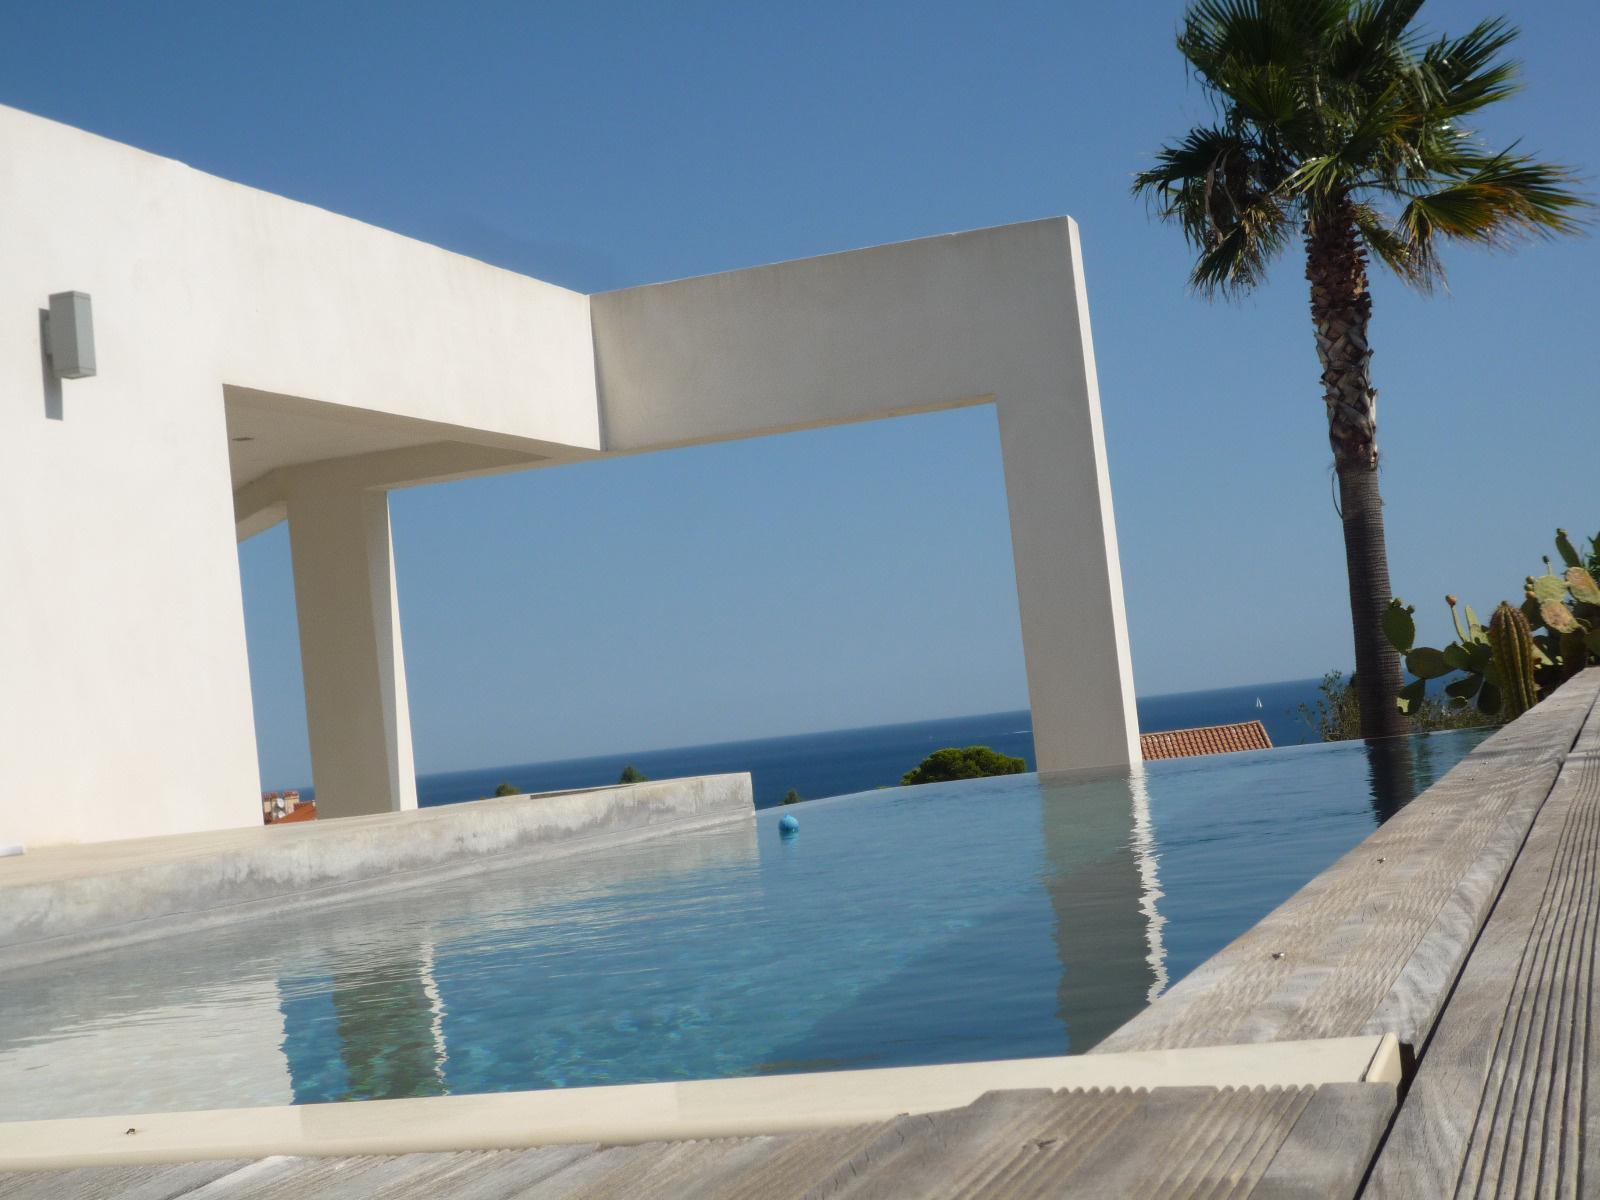 Offres de vente Maison / Villa Banyuls sur mer (66650)